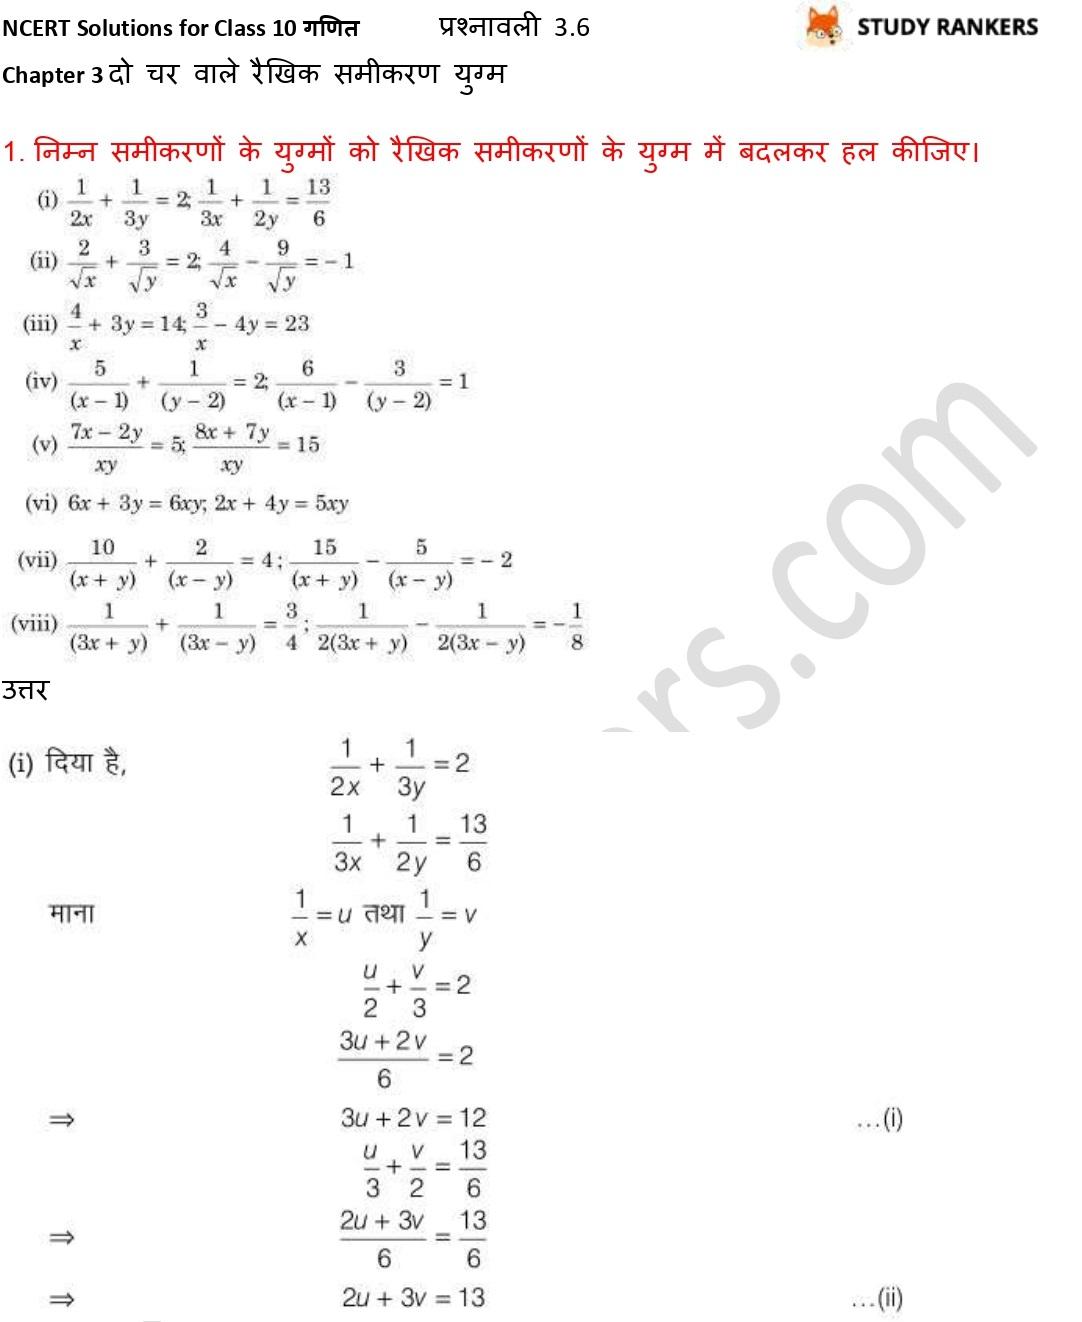 NCERT Solutions for Class 10 Maths Chapter 3 दो चर वाले रैखिक समीकरण युग्म प्रश्नावली 3.6 Part 1